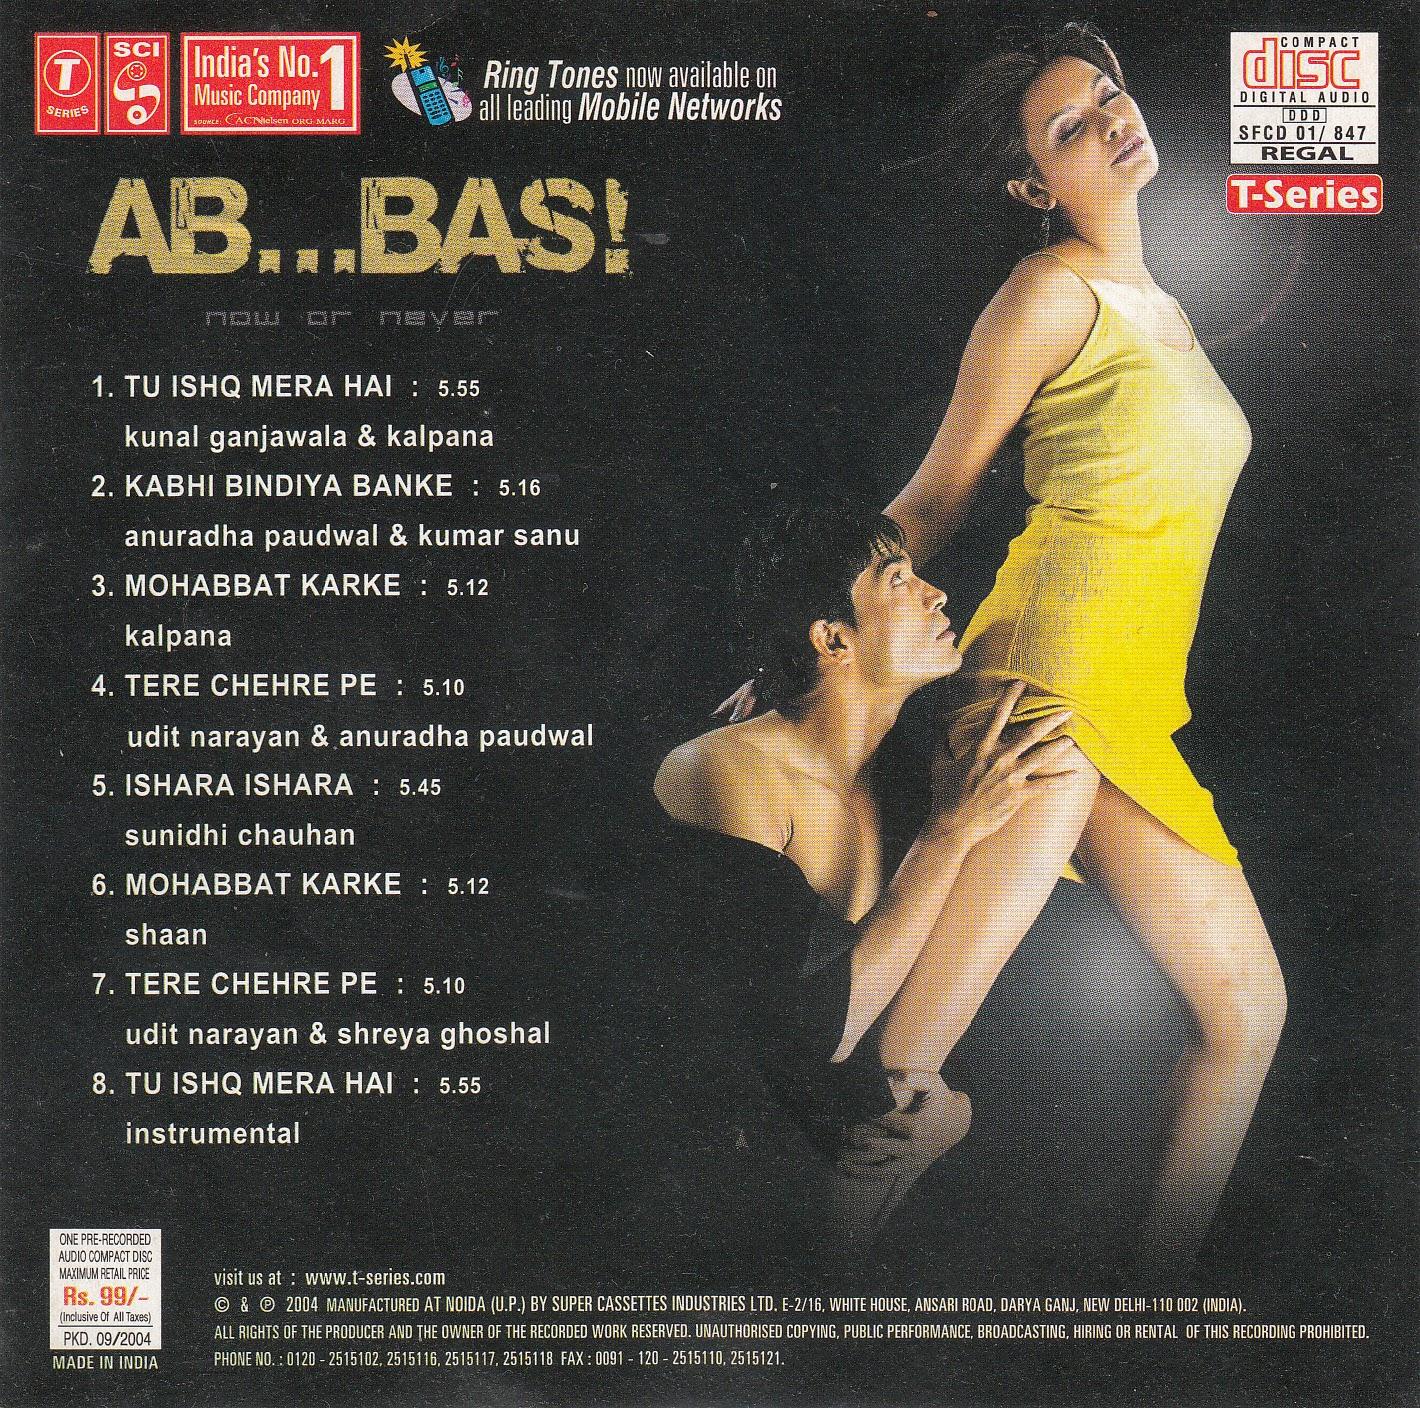 Mera Tu Hi Bas Yaara Mp3 Song Download: THE HOME OF SHREYA GHOSHAL SONGS: Ab Bas ! [2004-MP3-VBR